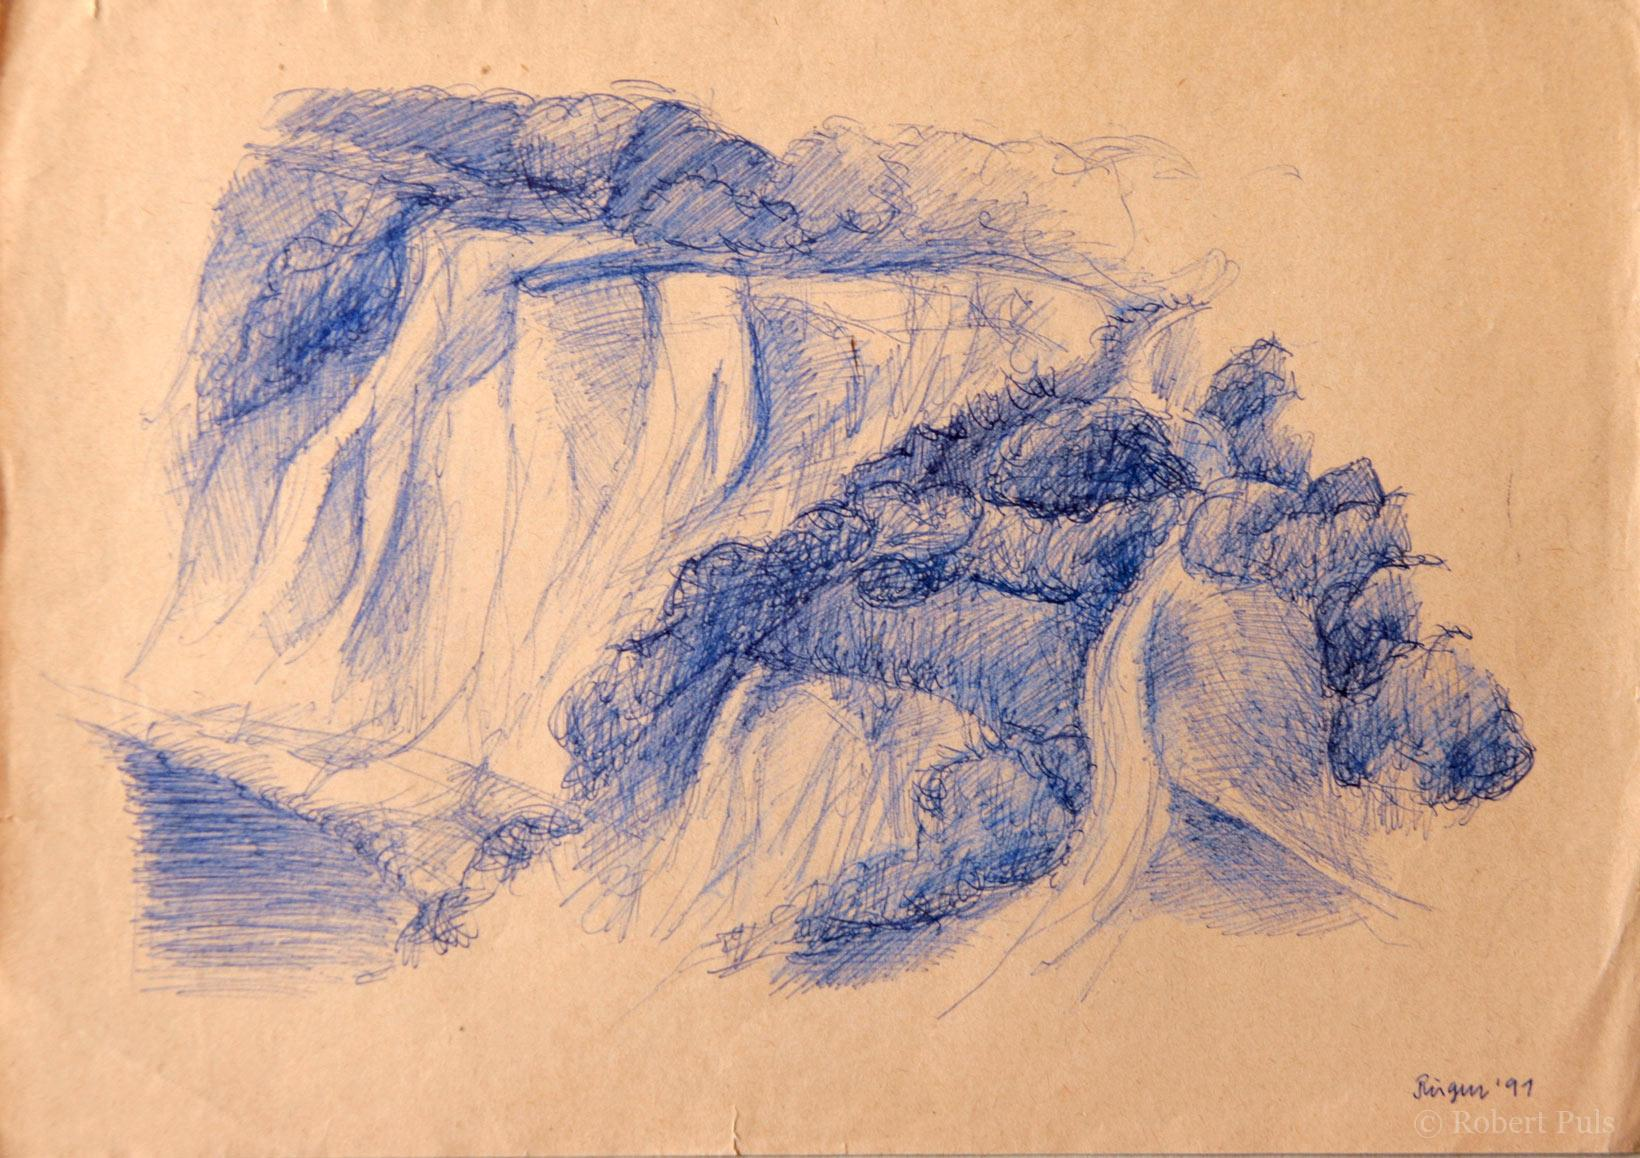 Insel Rügen, Zeichnung Kugelschreiber, Robert Puls